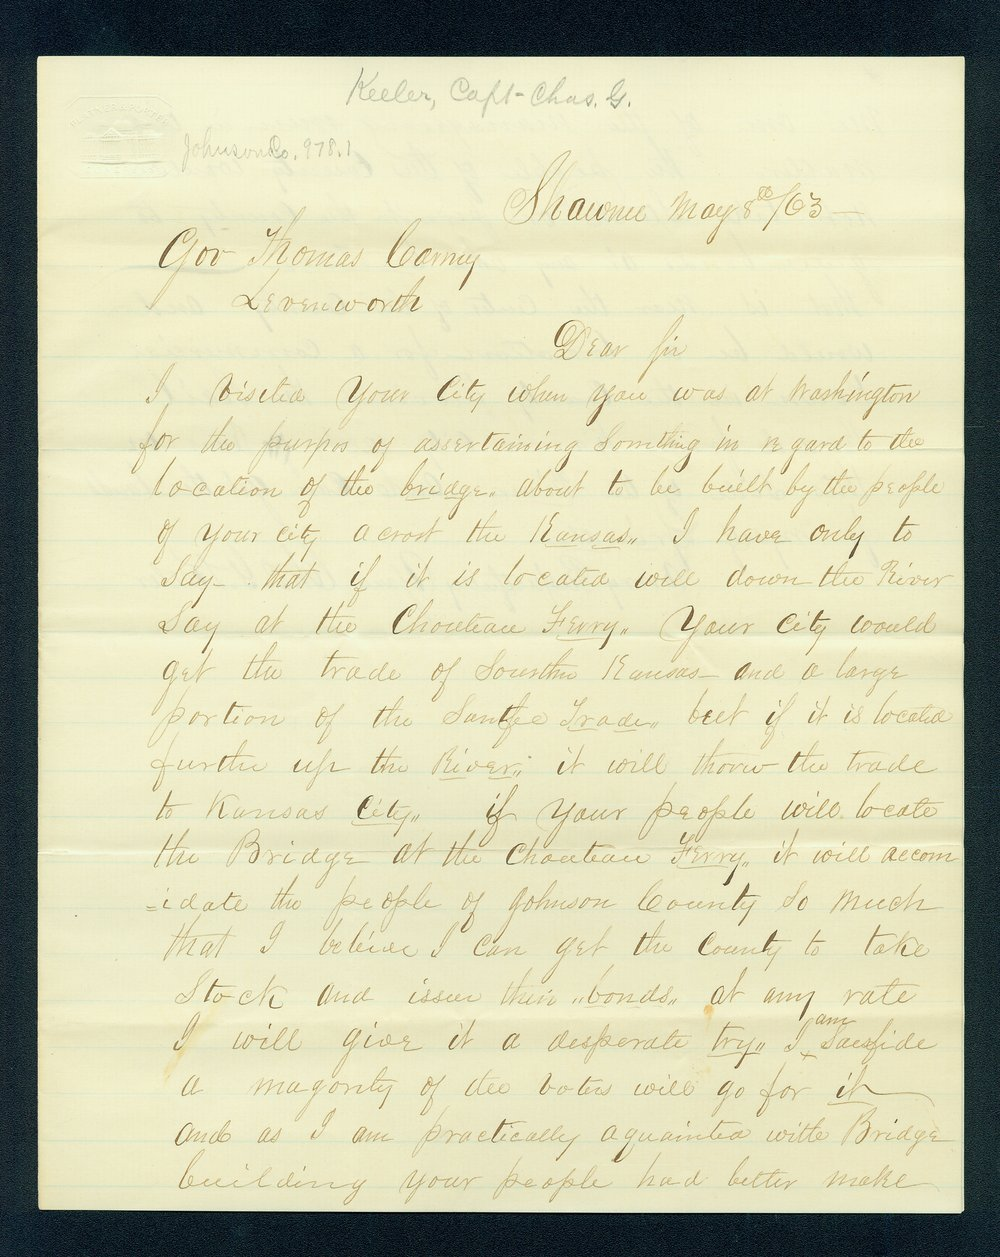 Charles Keeler to Governor Thomas Carney - 1